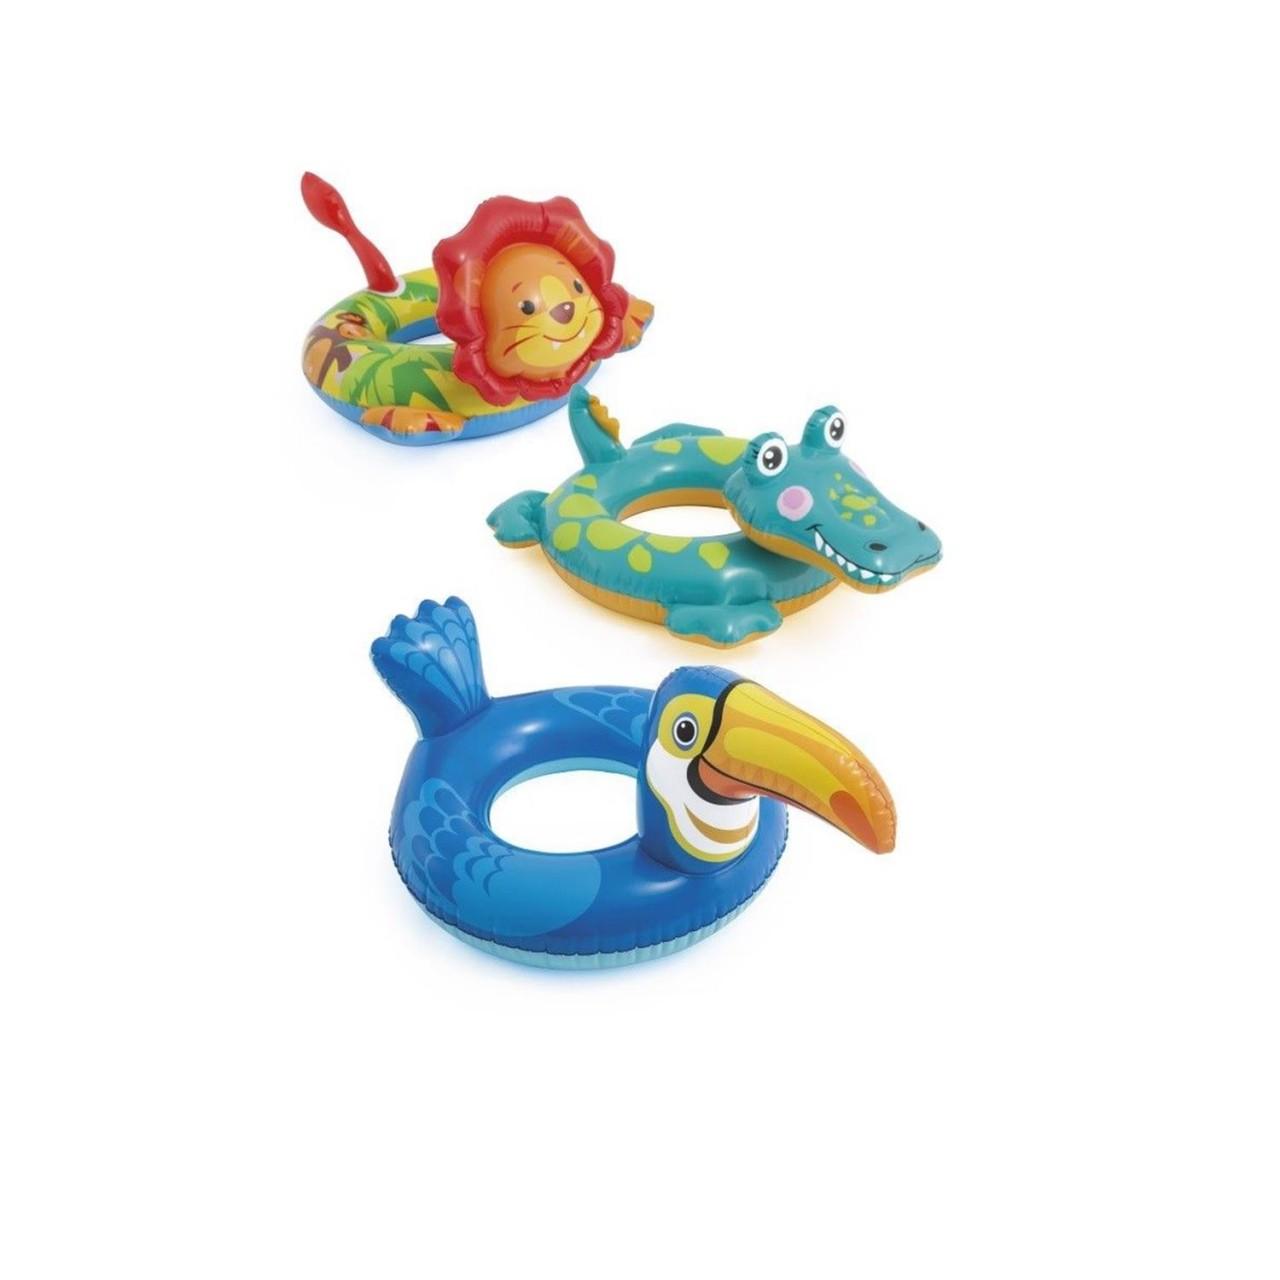 Intex 58221 Kinder Deluxe Schwimmring Animals mit Tierkopf 3 Varianten